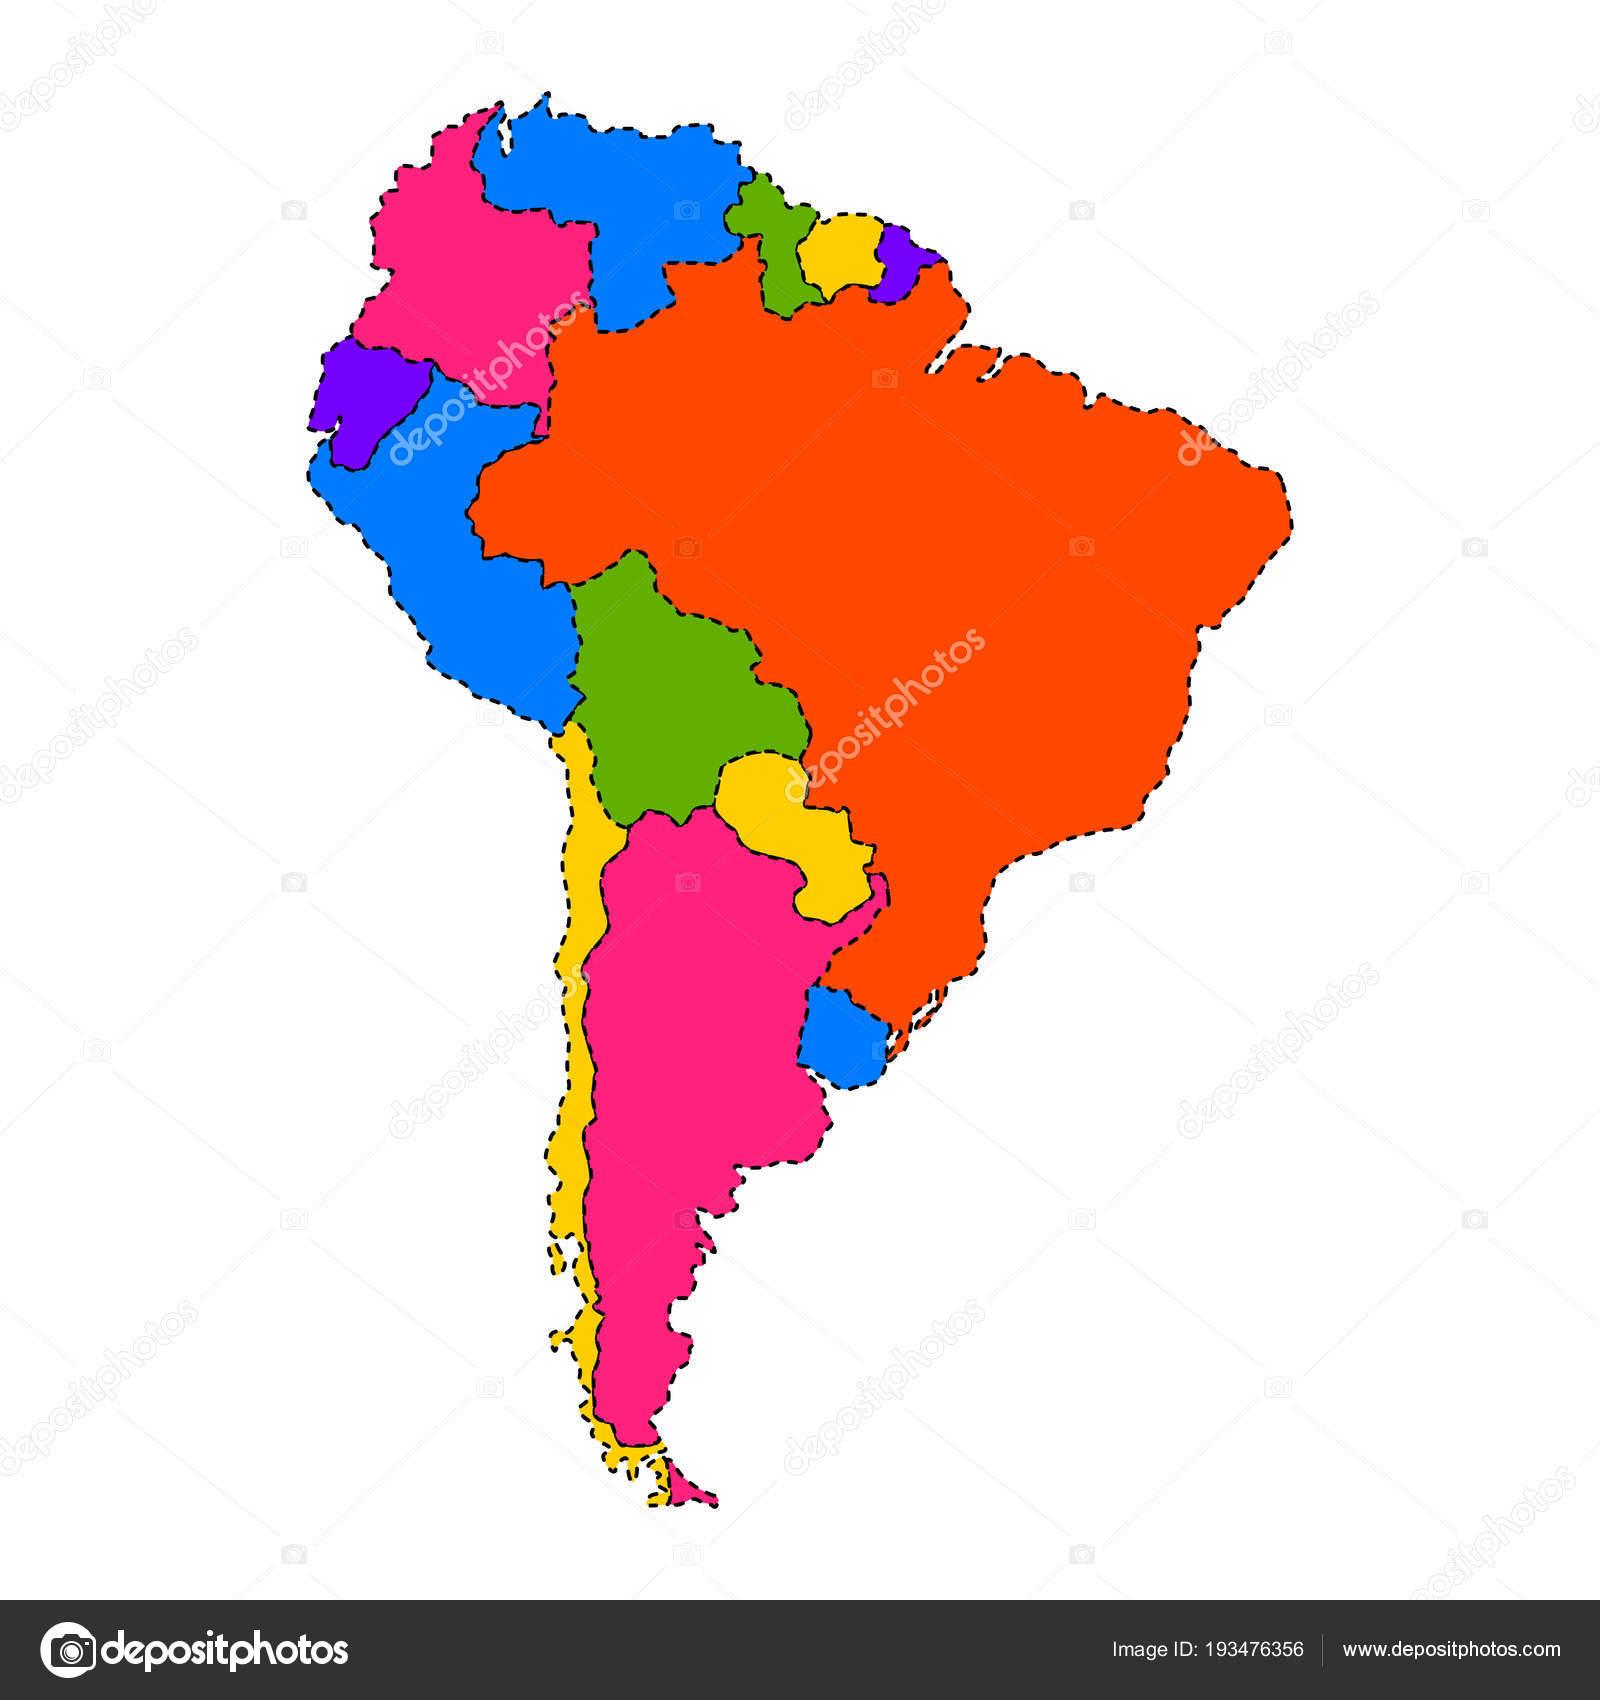 Mapa Politico De Sudamerica.Mapa Fisico Sudamerica Mapa Politico De America Del Sur